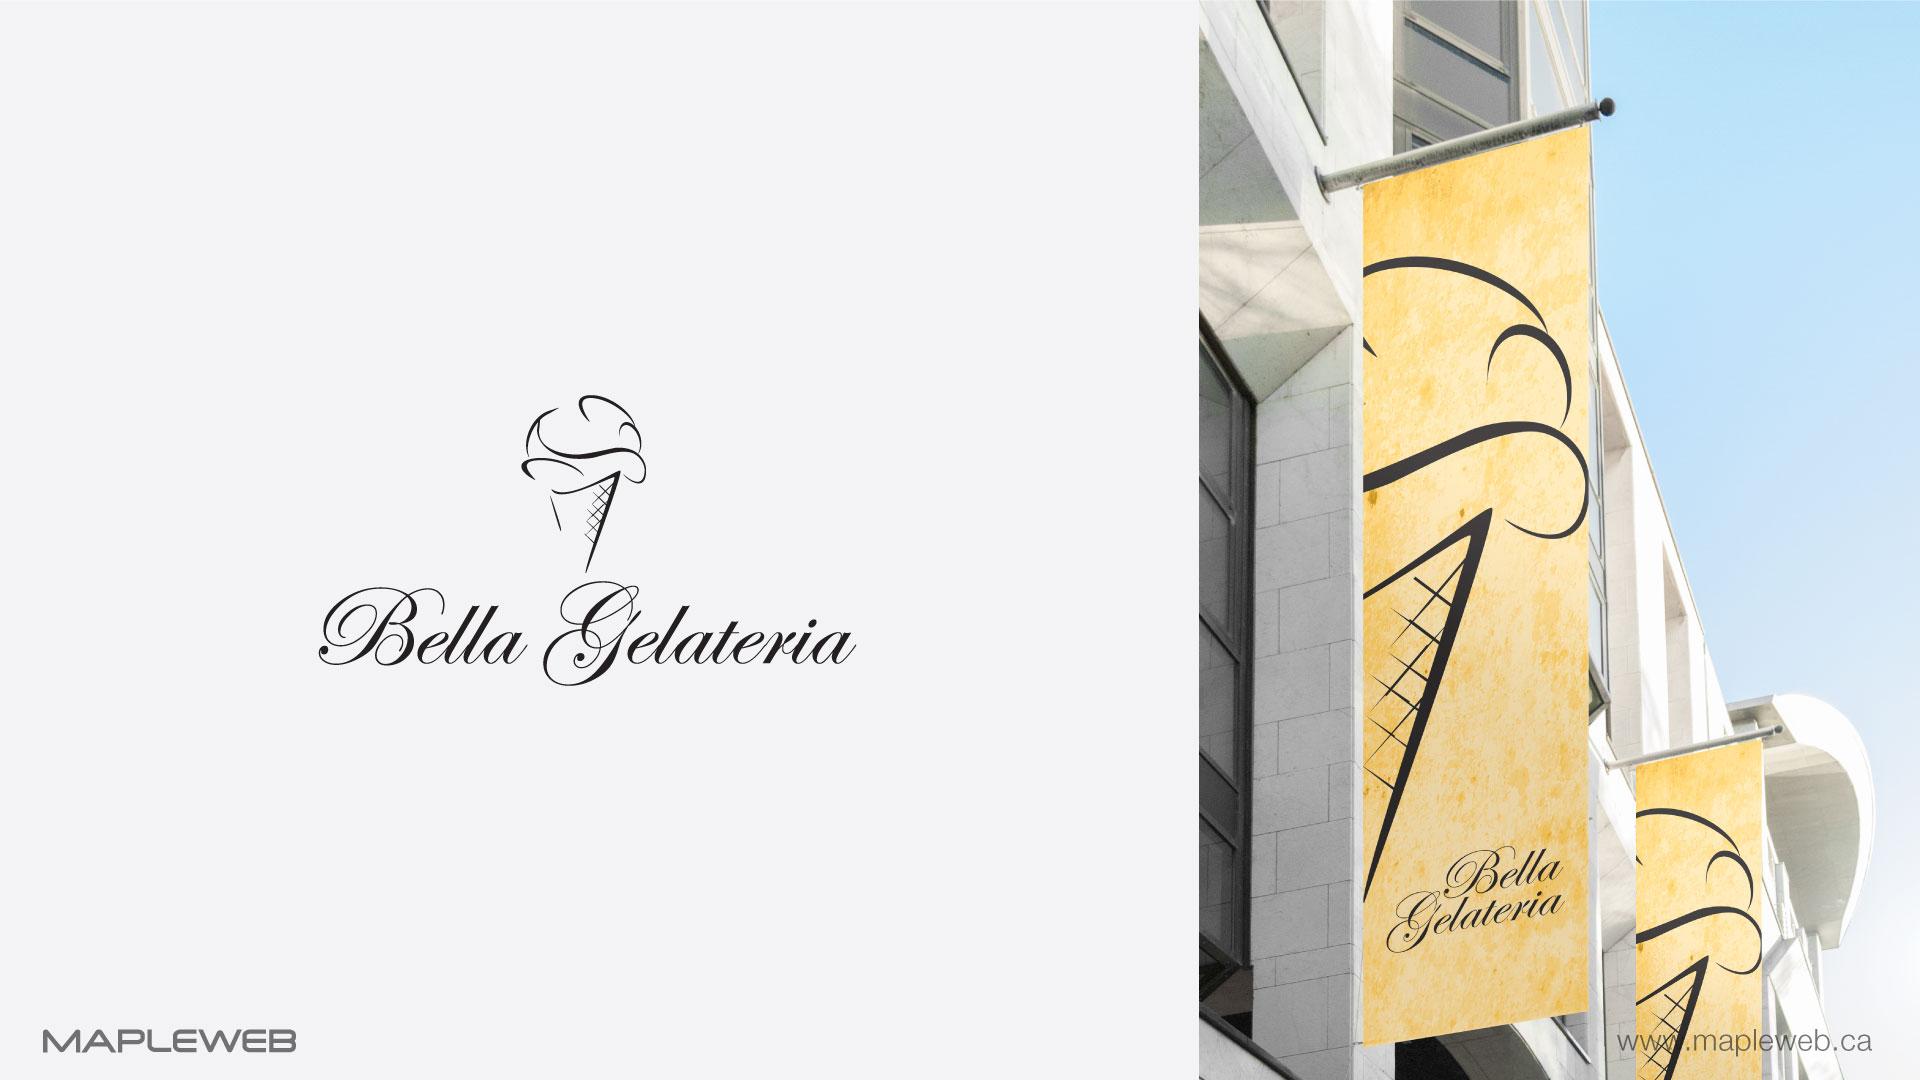 bella-gelateria-brand-logo-design-by-mapleweb-vancouver-canada-banner-cart-mock